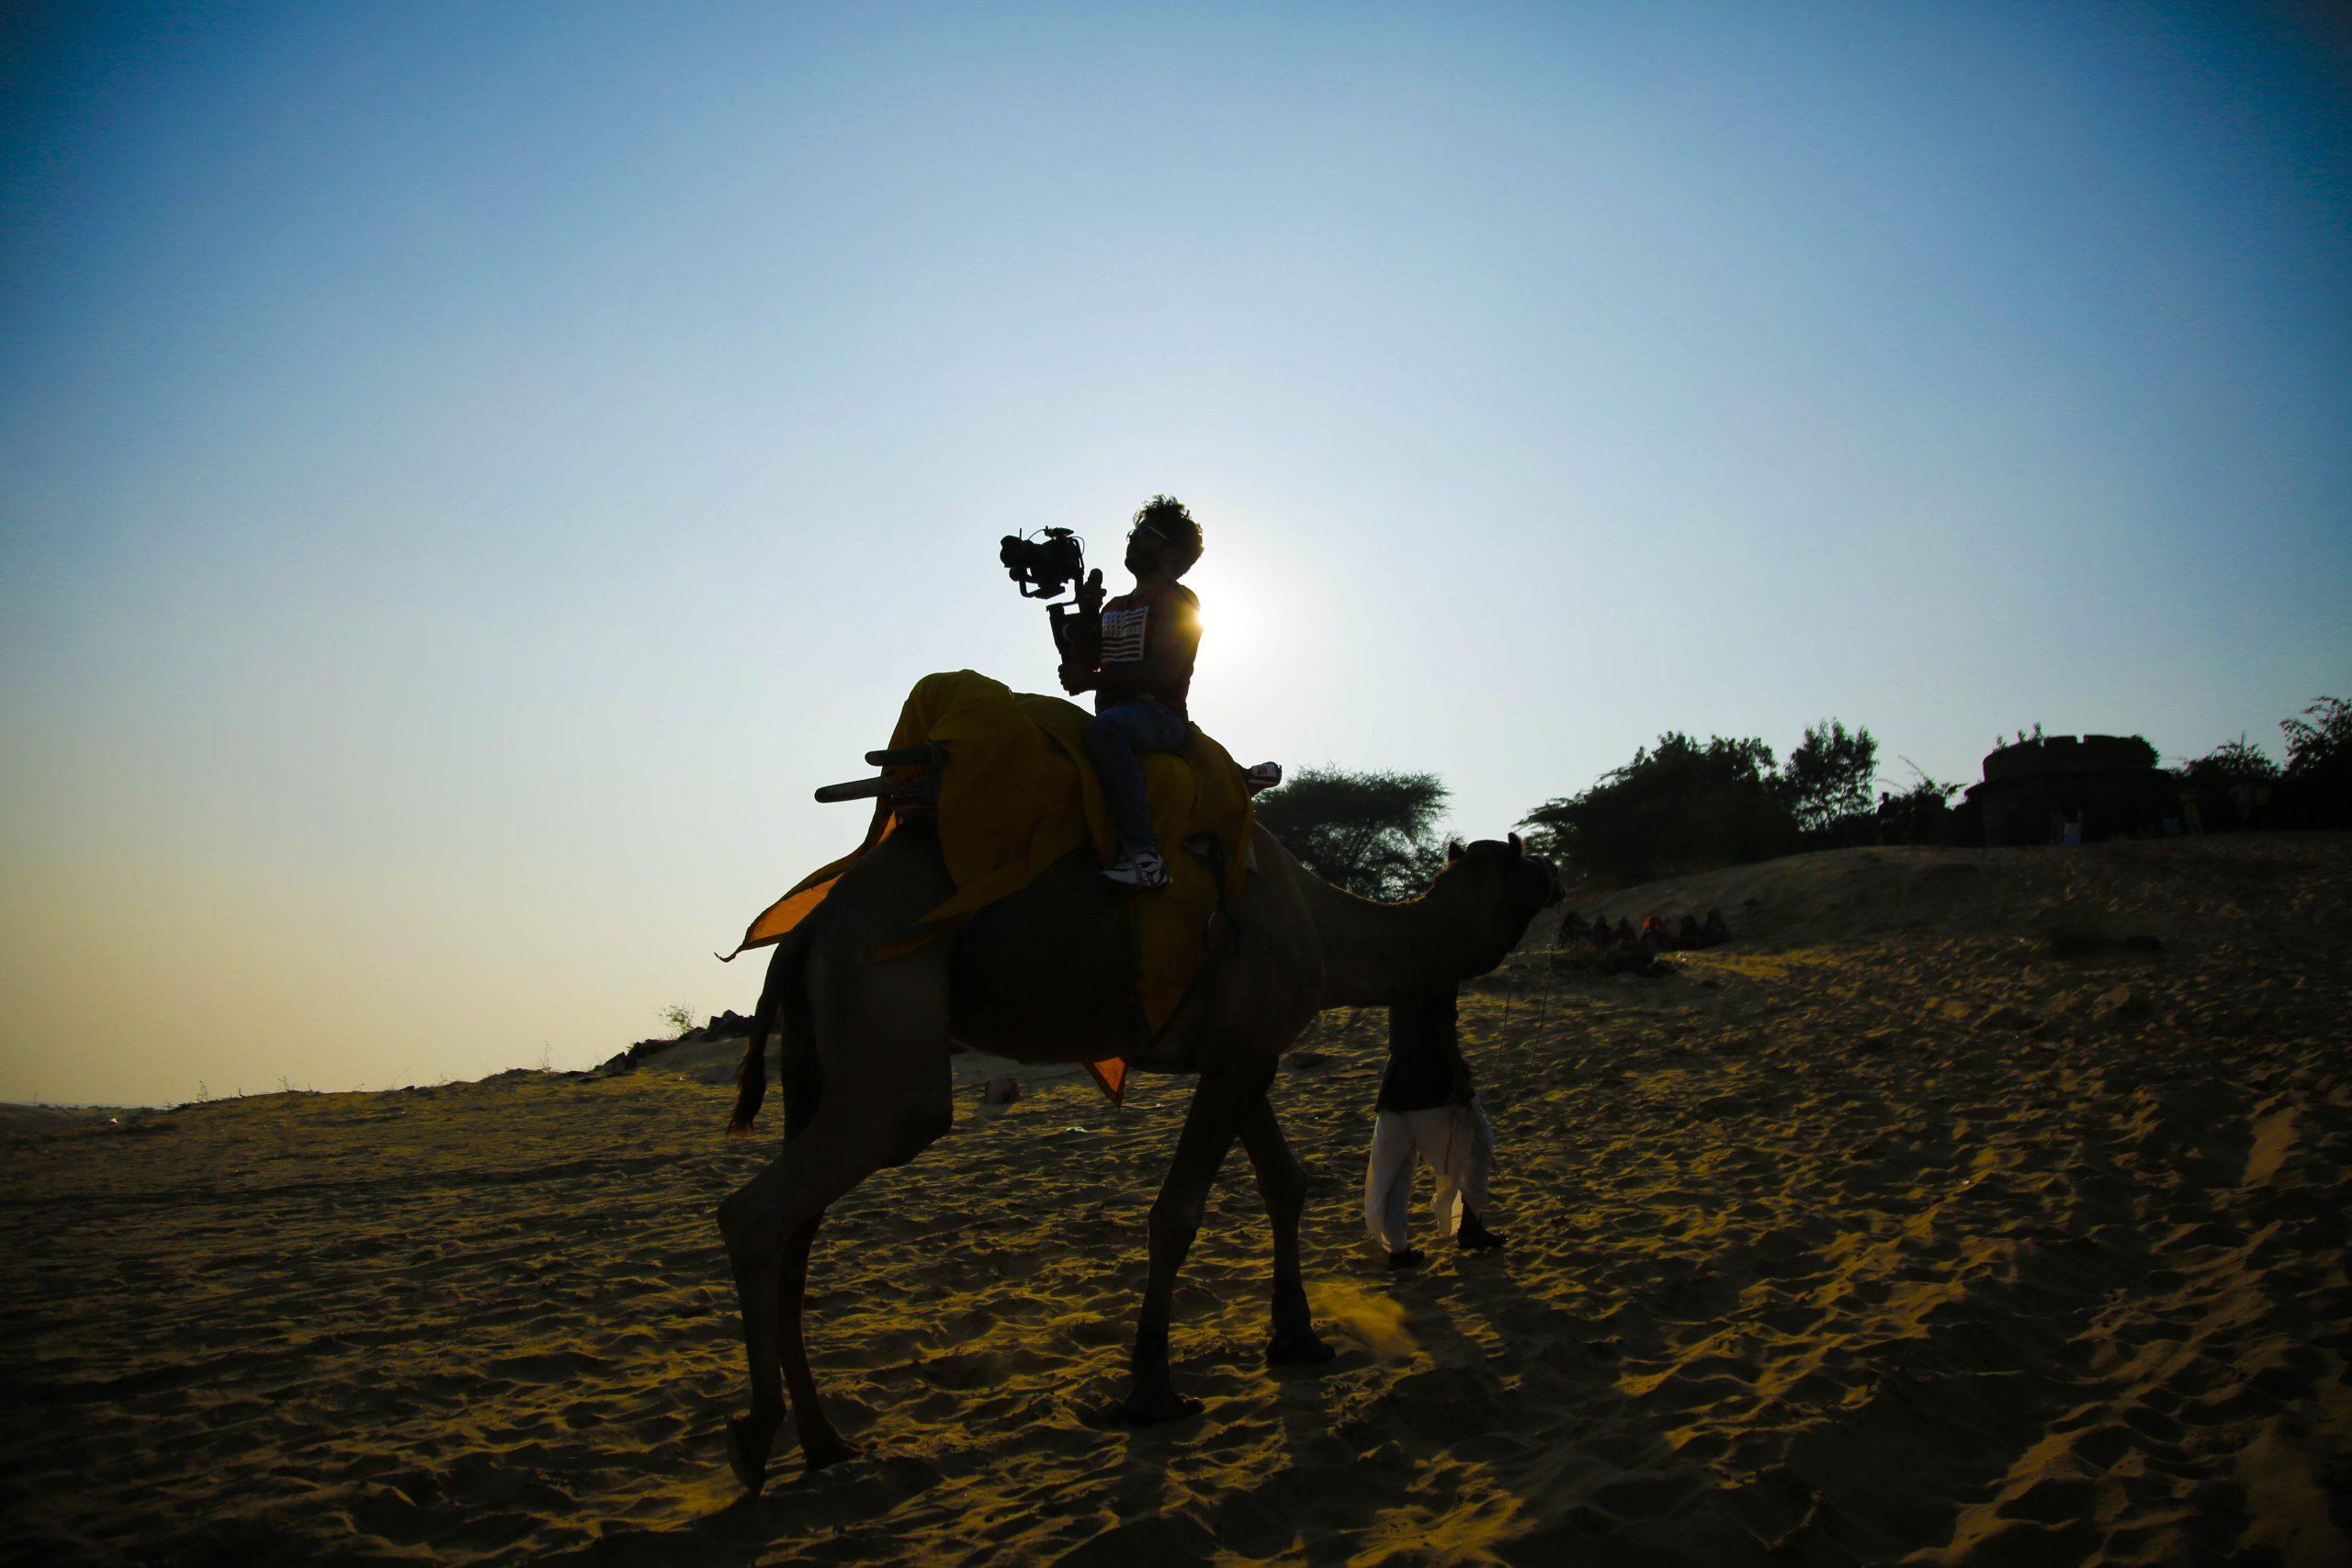 Cameraman on camel silhouette